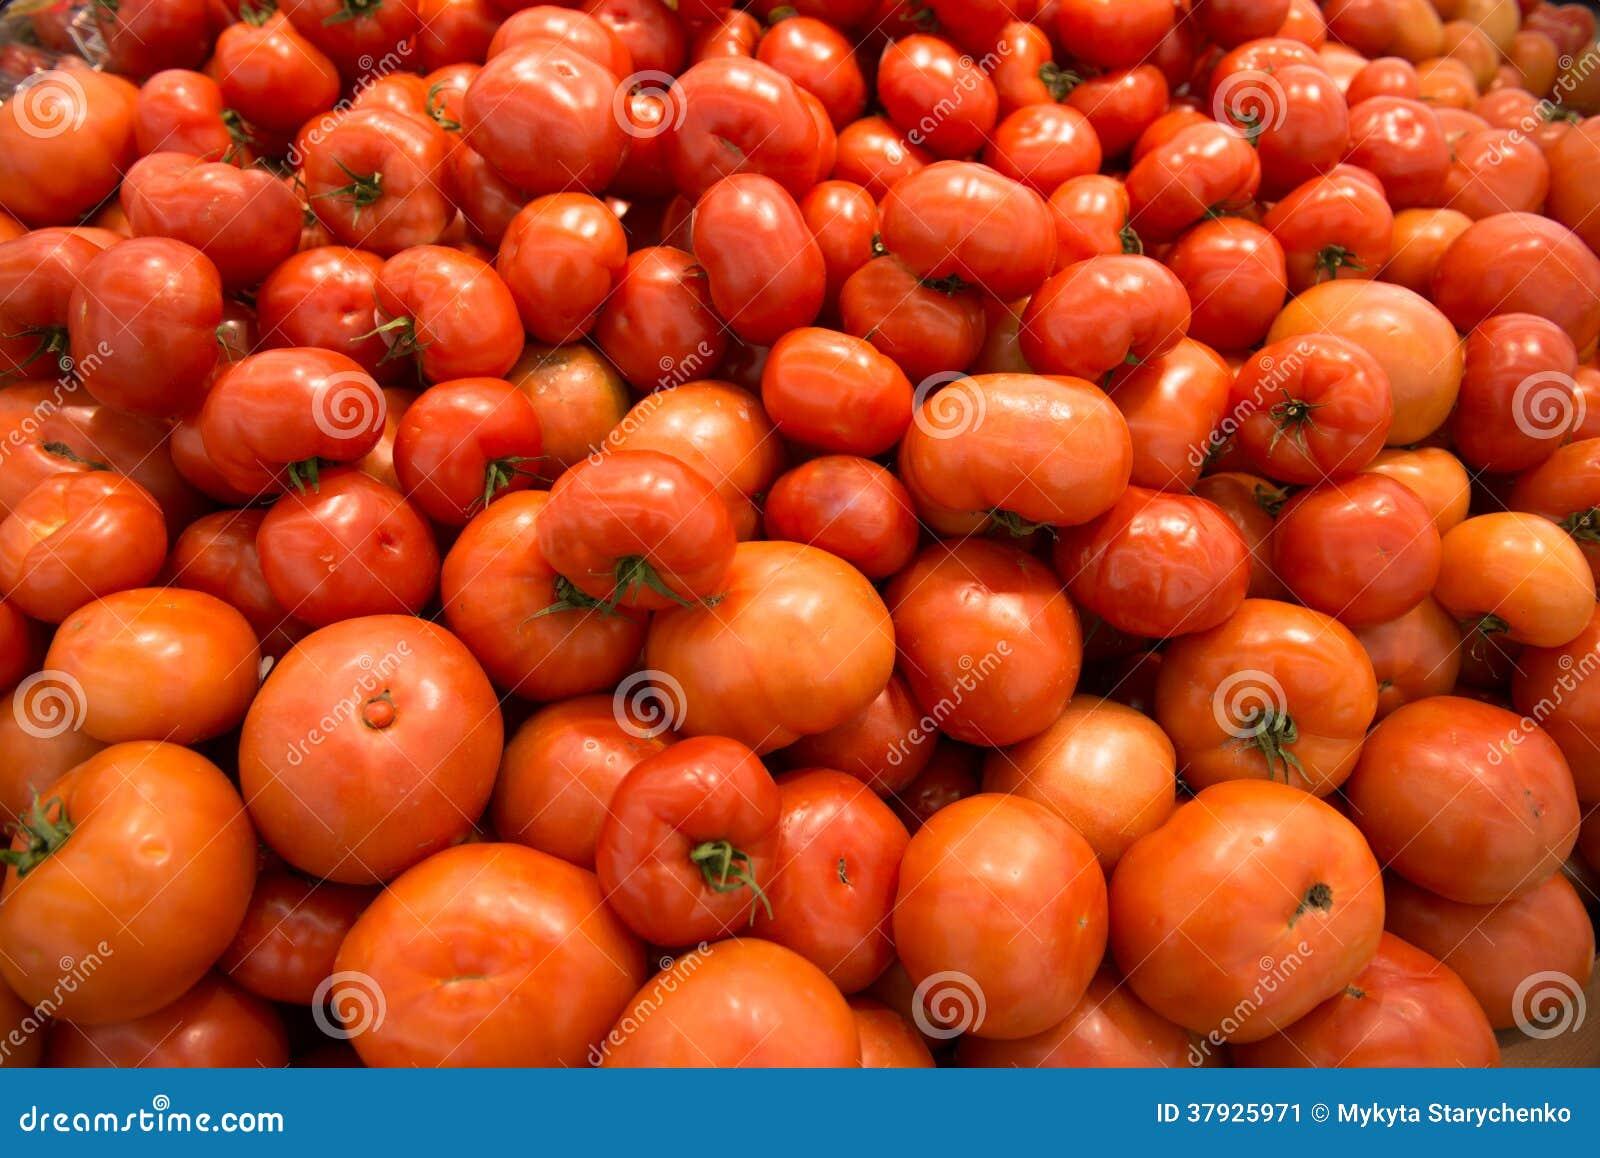 Красные томаты на супермаркете